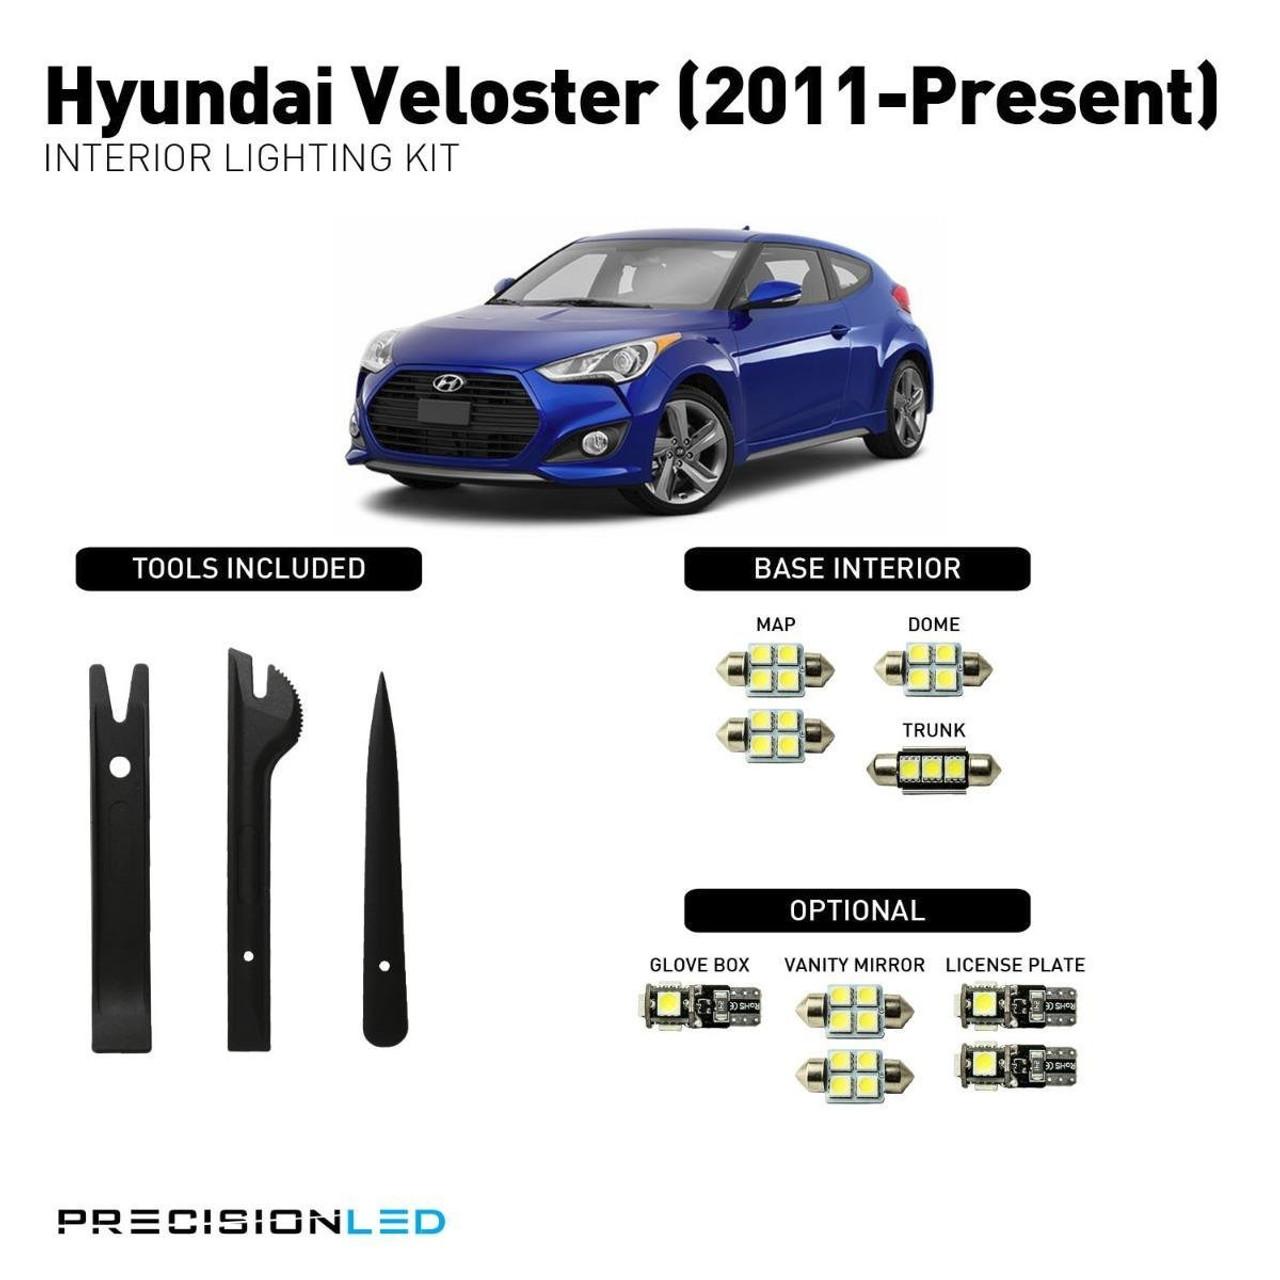 Hyundai Veloster LED Interior Package (2011-Present)